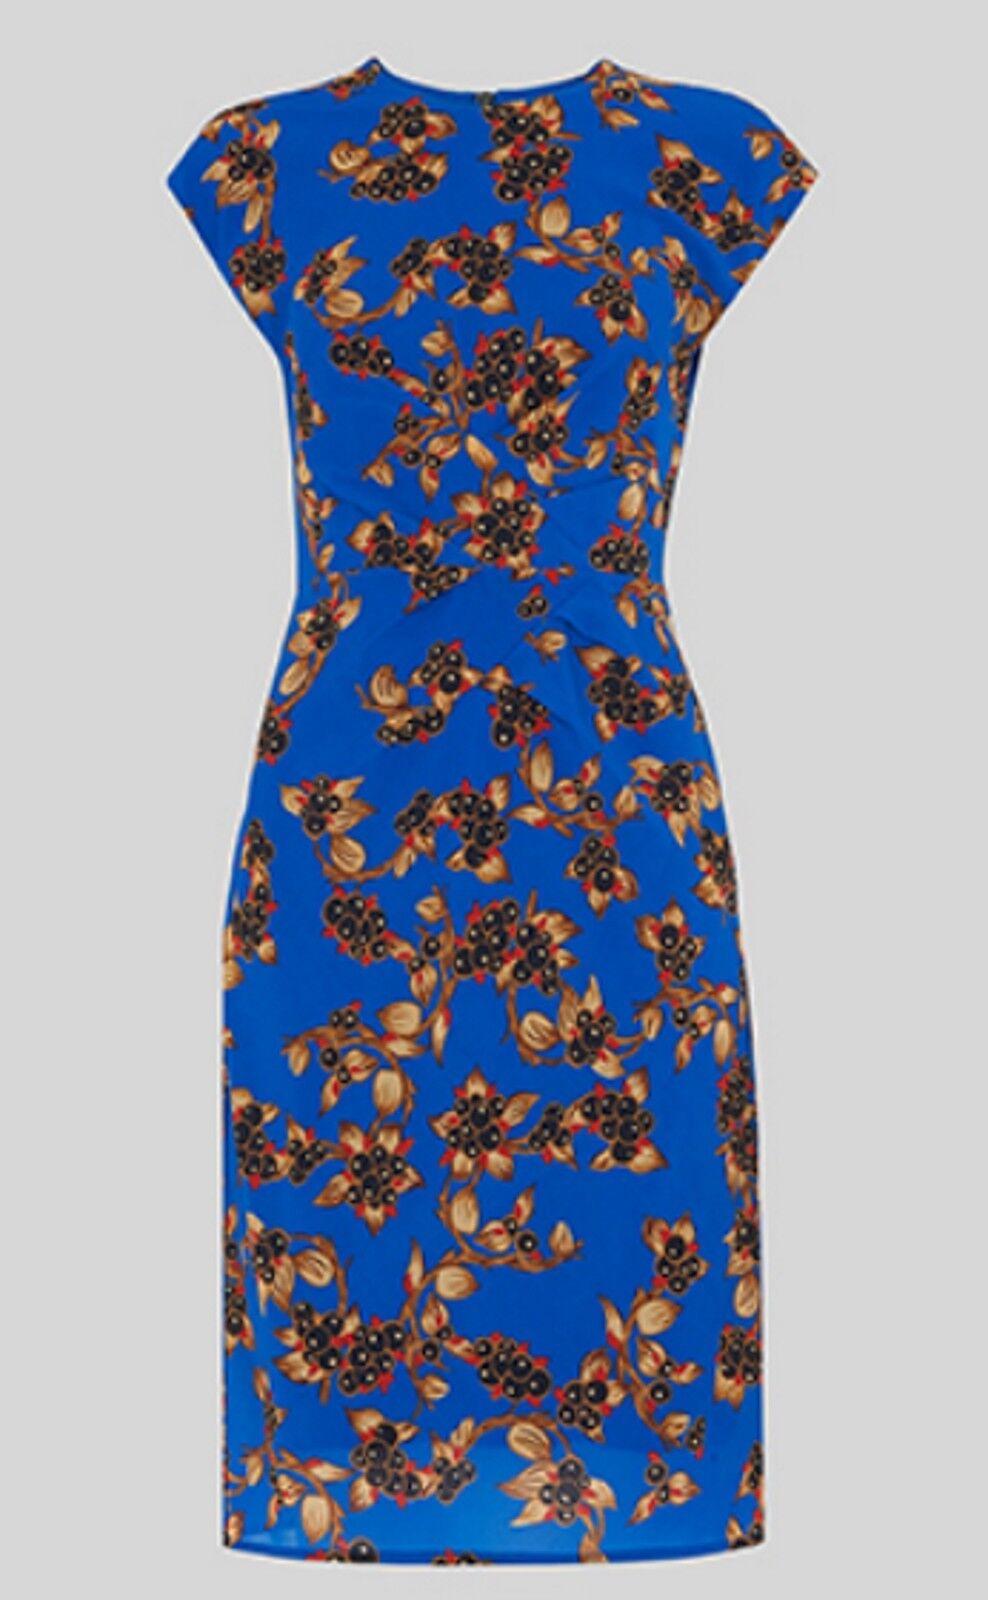 Whistles Capri Print Silk Bodycon - Blau Blau Blau Multi - U.K. 14 - Brand New With Tags | Adoptieren  | Online Kaufen  | Stilvoll und lustig  6cf66c